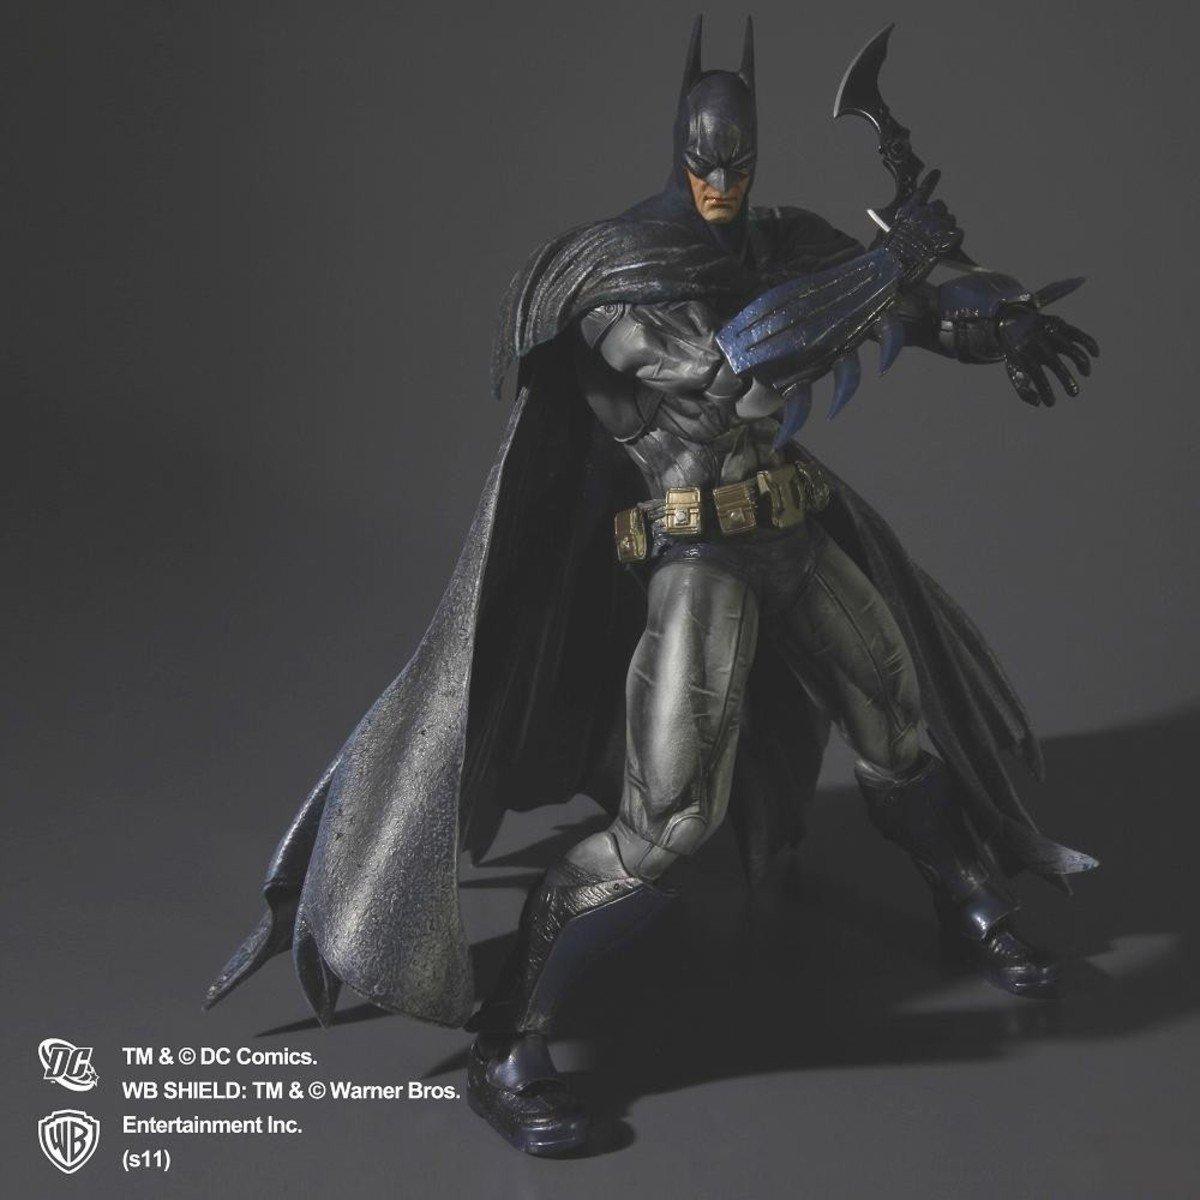 Play Arts Kai 系列 蝙蝠俠:阿卡漢瘋人院 -  裝甲版 蝙蝠俠